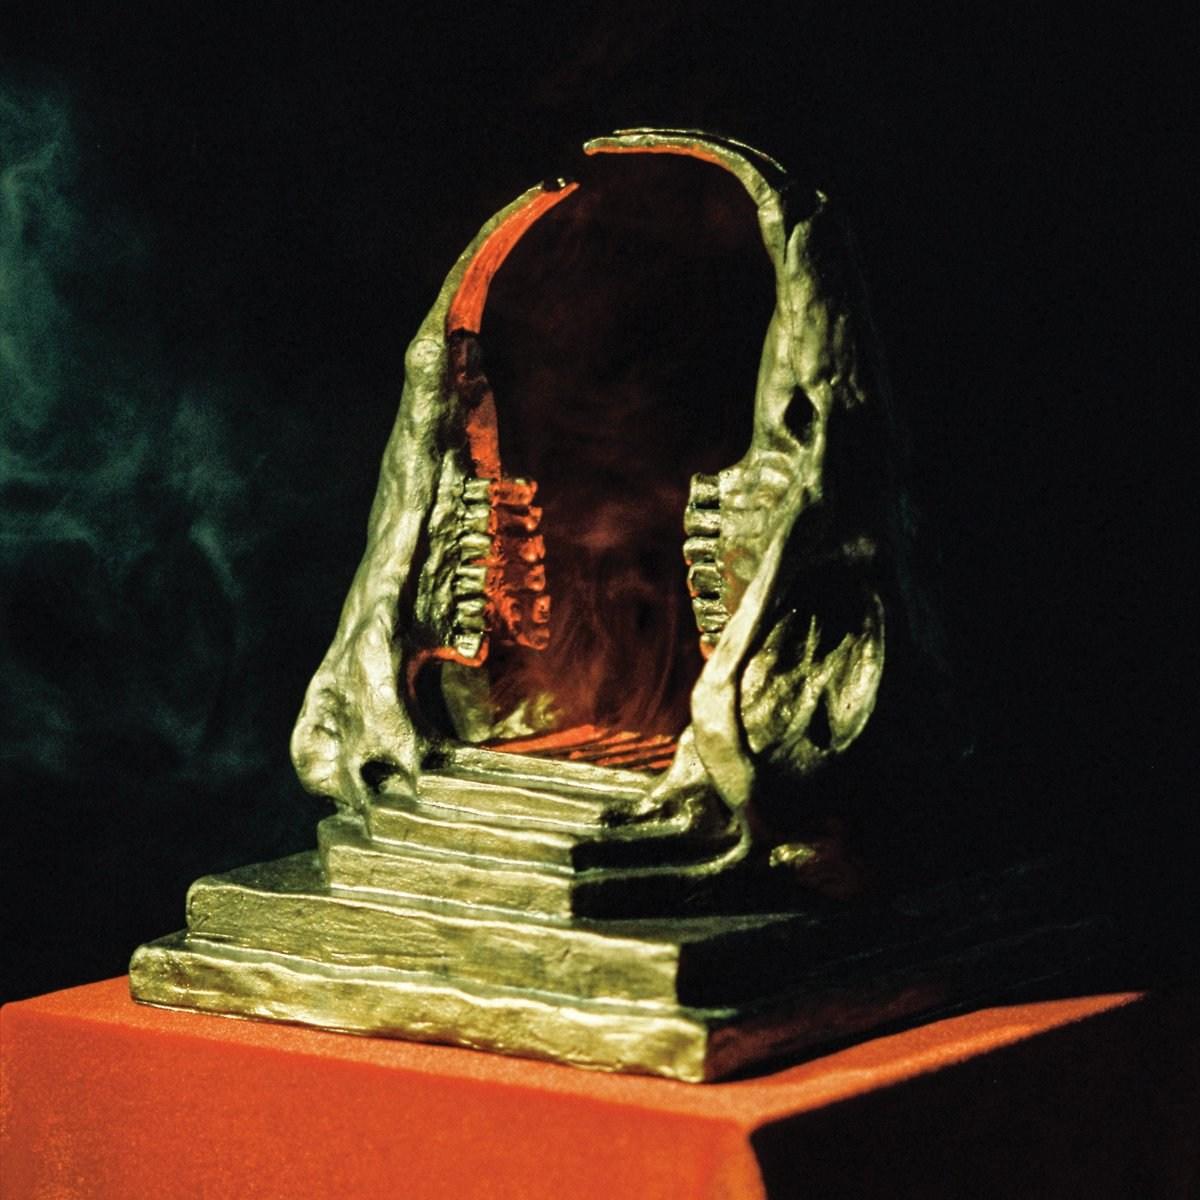 King Gizzard Infest the Rats Nest artwork